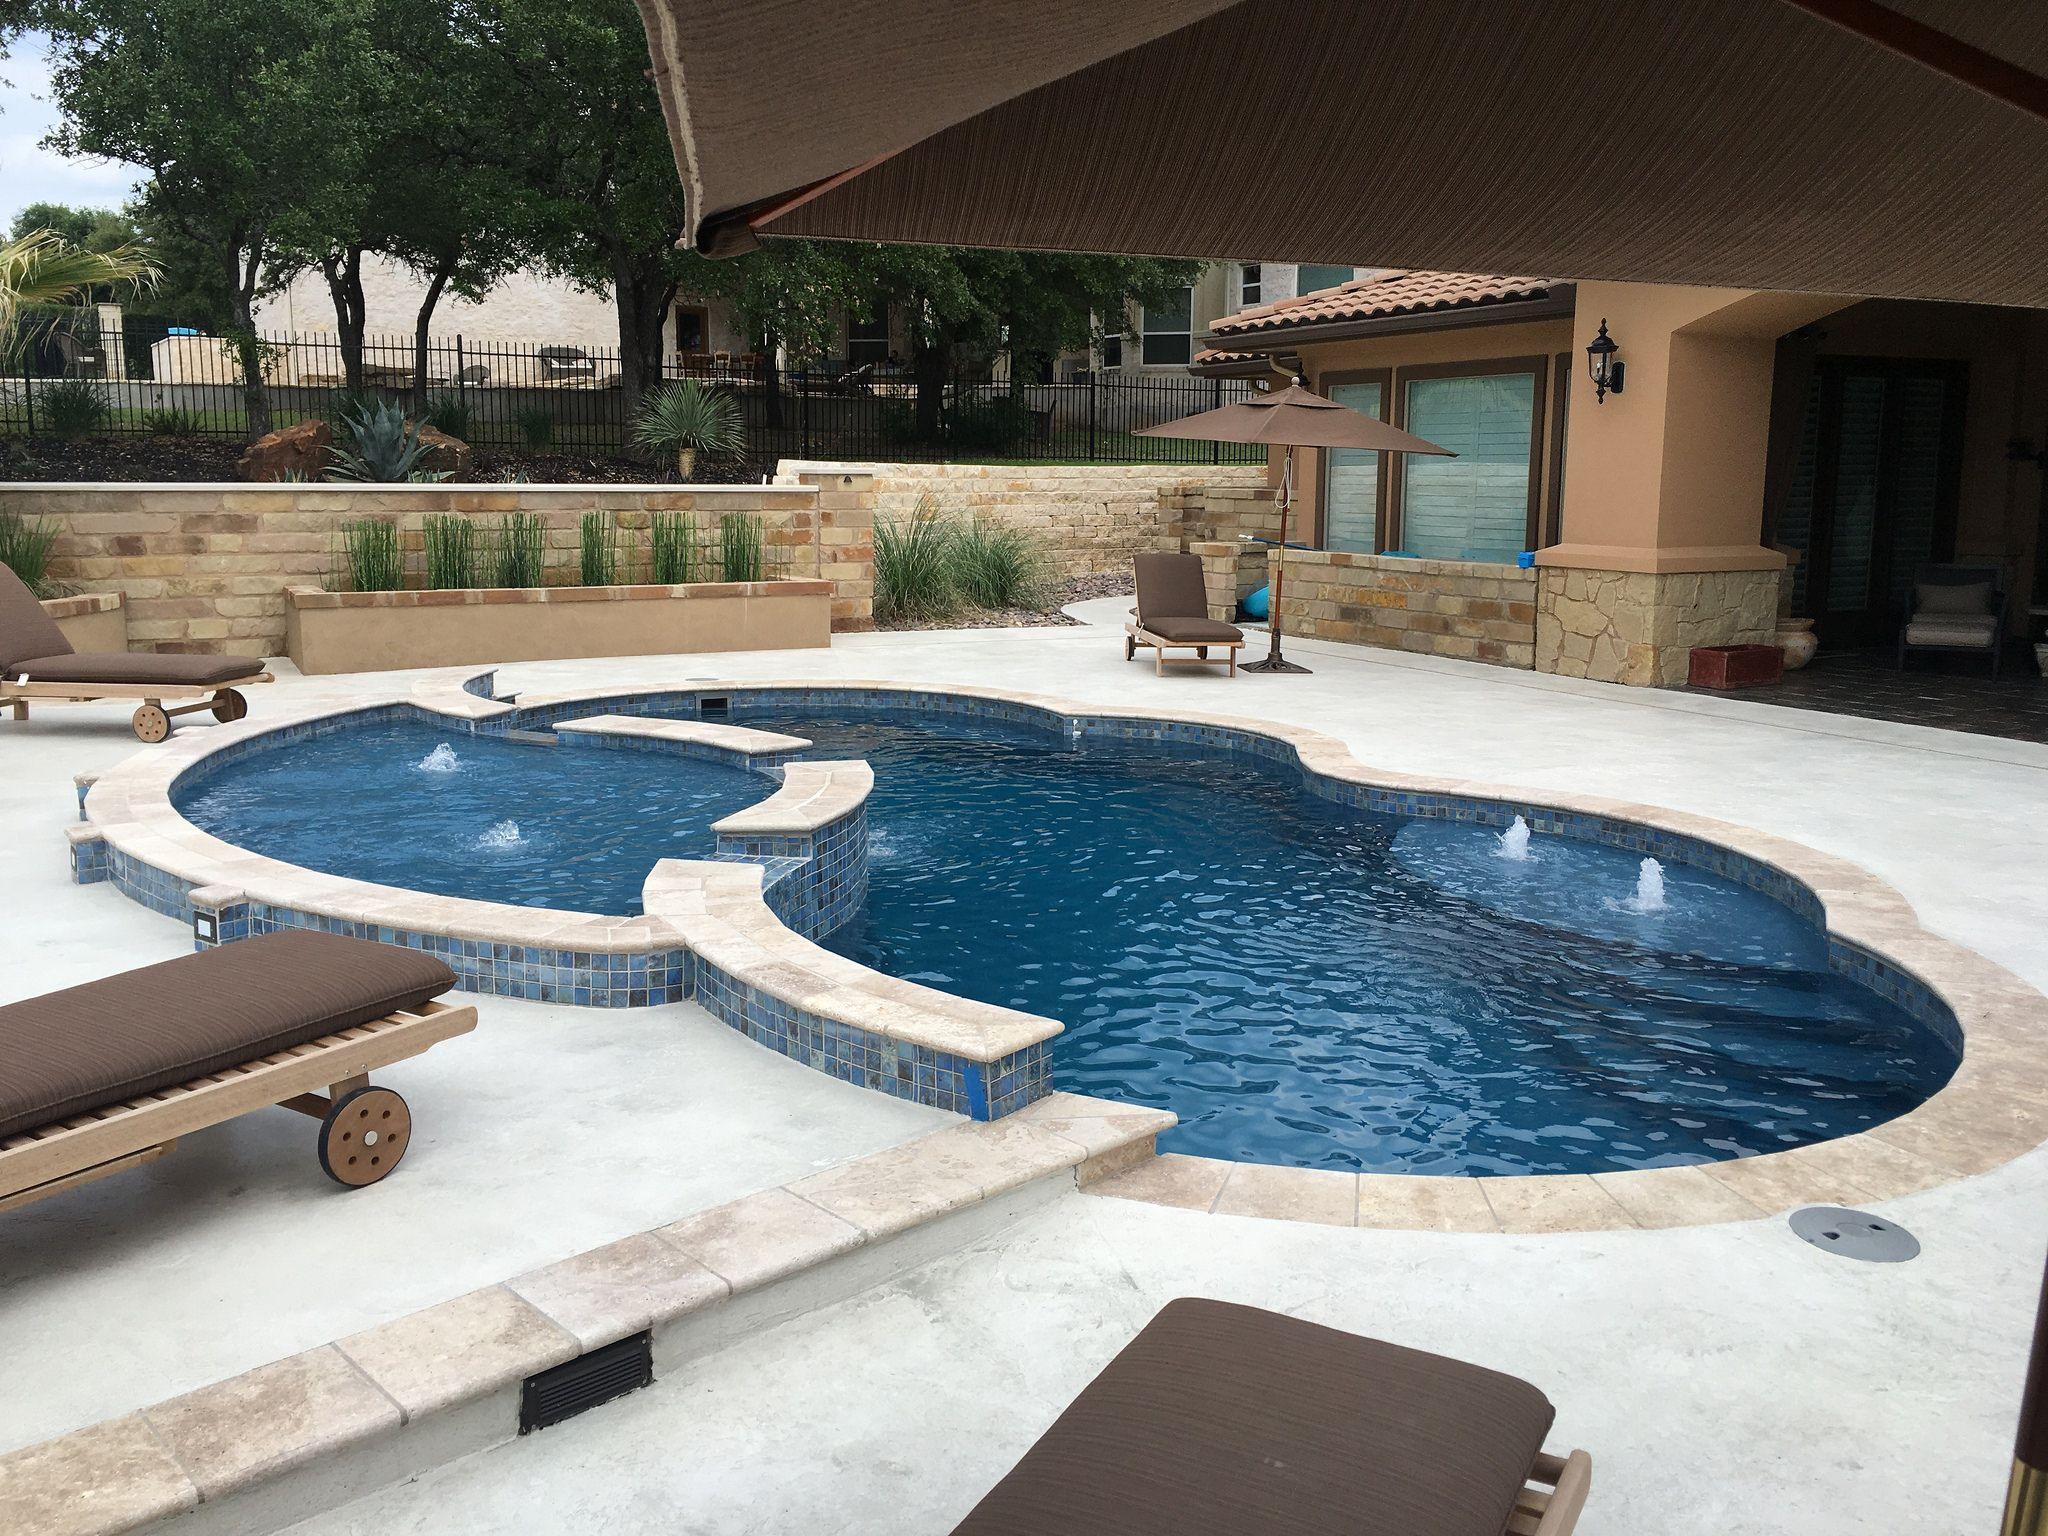 Aquamarine Pools of Texas Viking Pools Gemini with Tanning Ledge